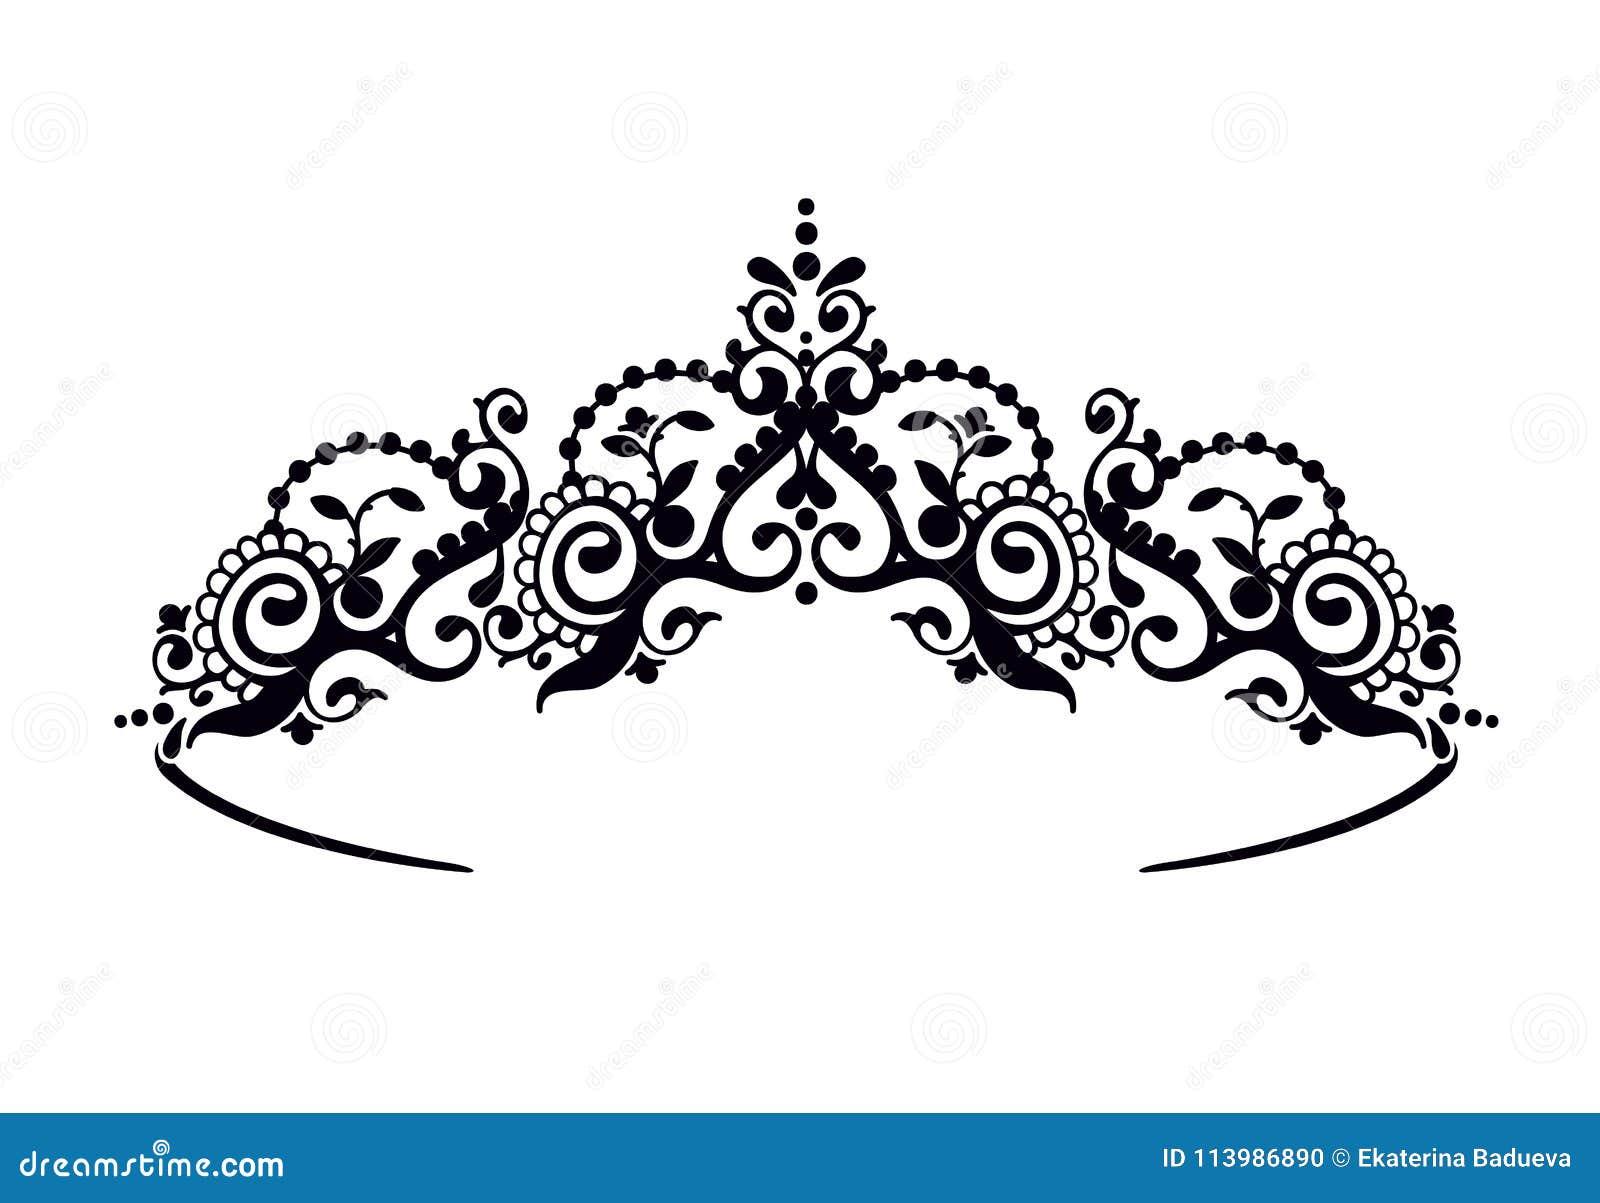 Corona Princesa Negra Png Wwwimagenesmycom